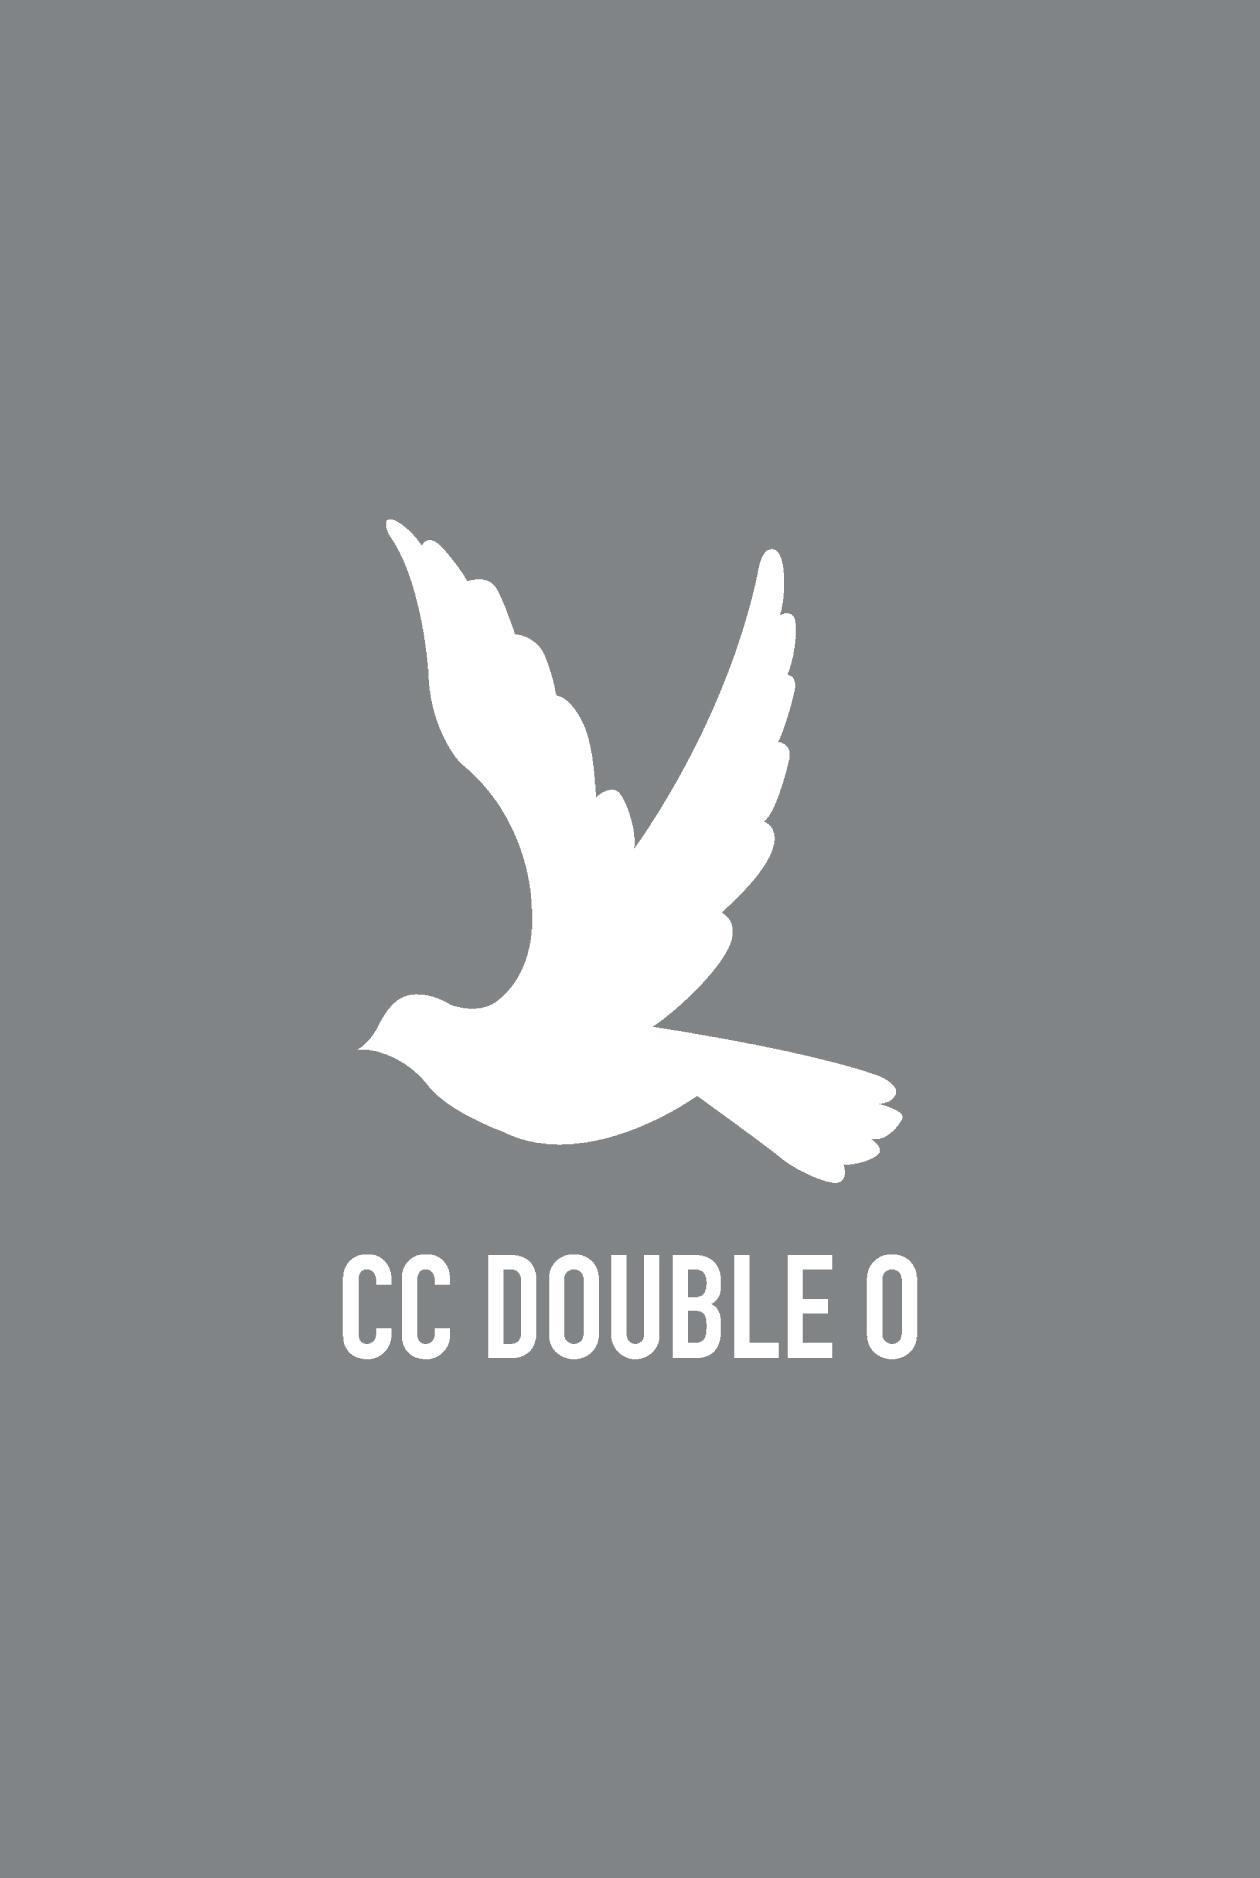 Bird Logo Cap with CC DOUBLE O Brim Detail